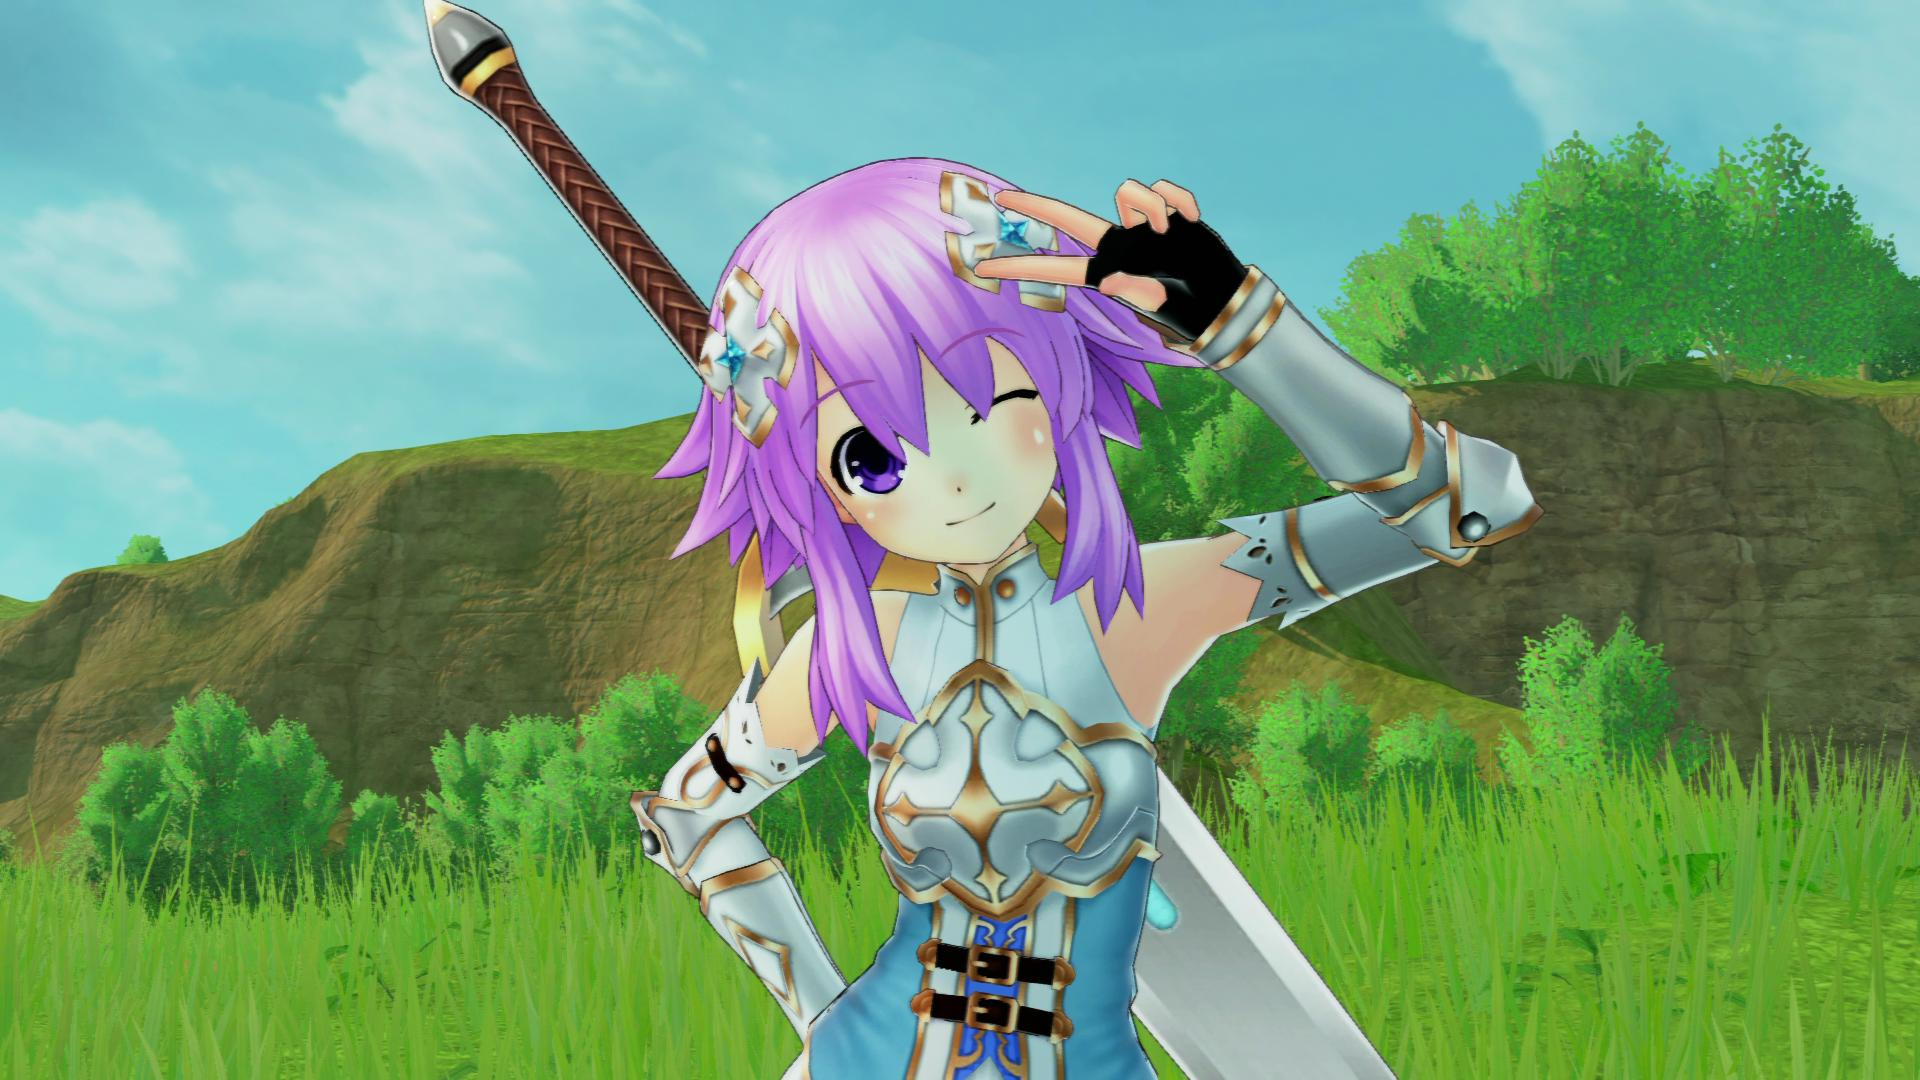 Release - Cyberdimension Neptunia: 4 Goddesses Online ...